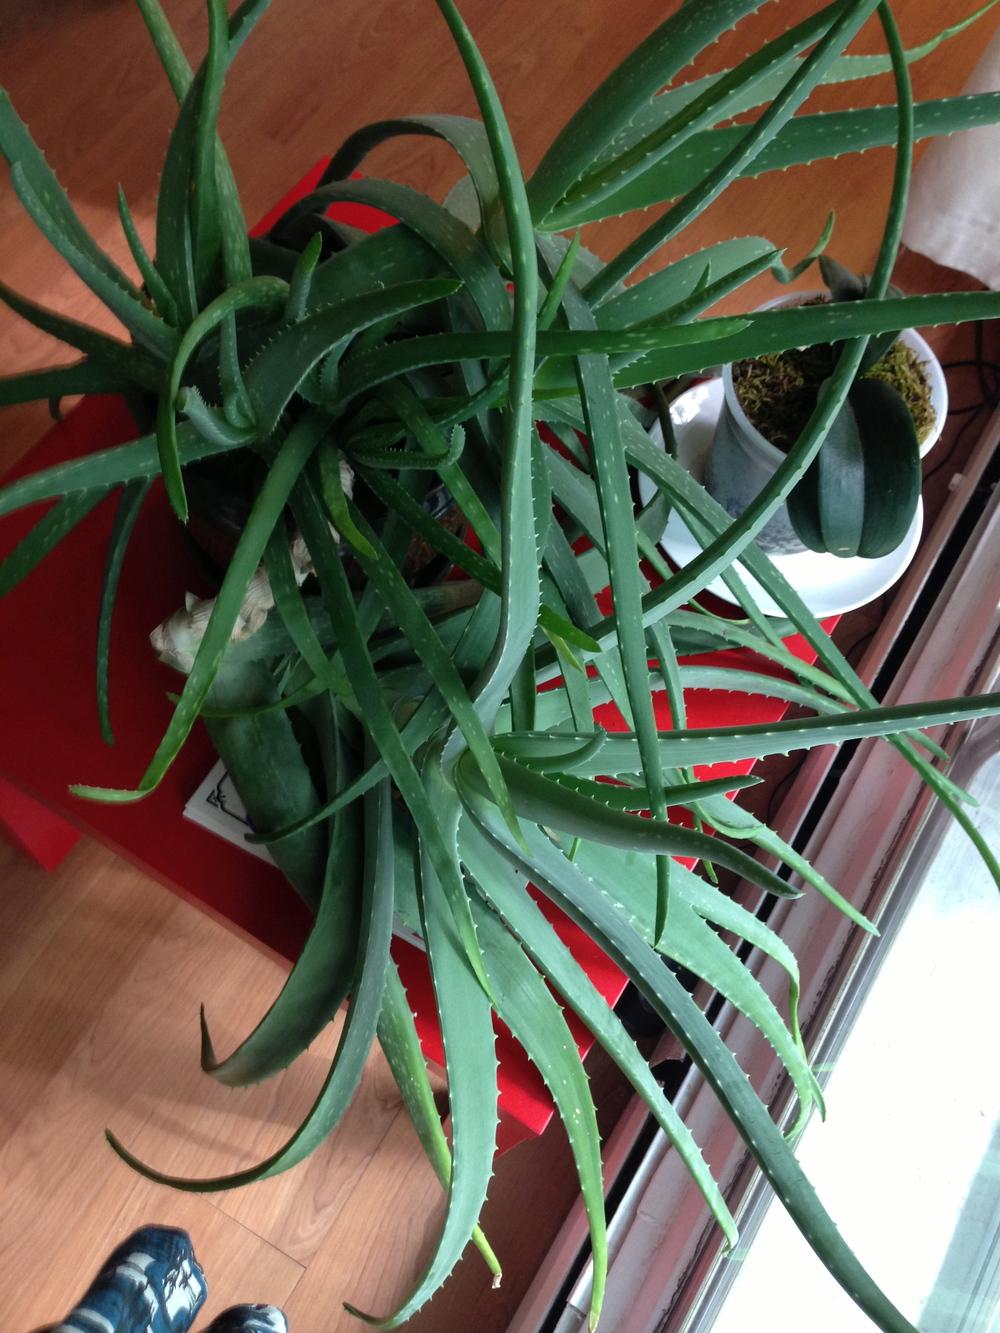 The Aloe Vera